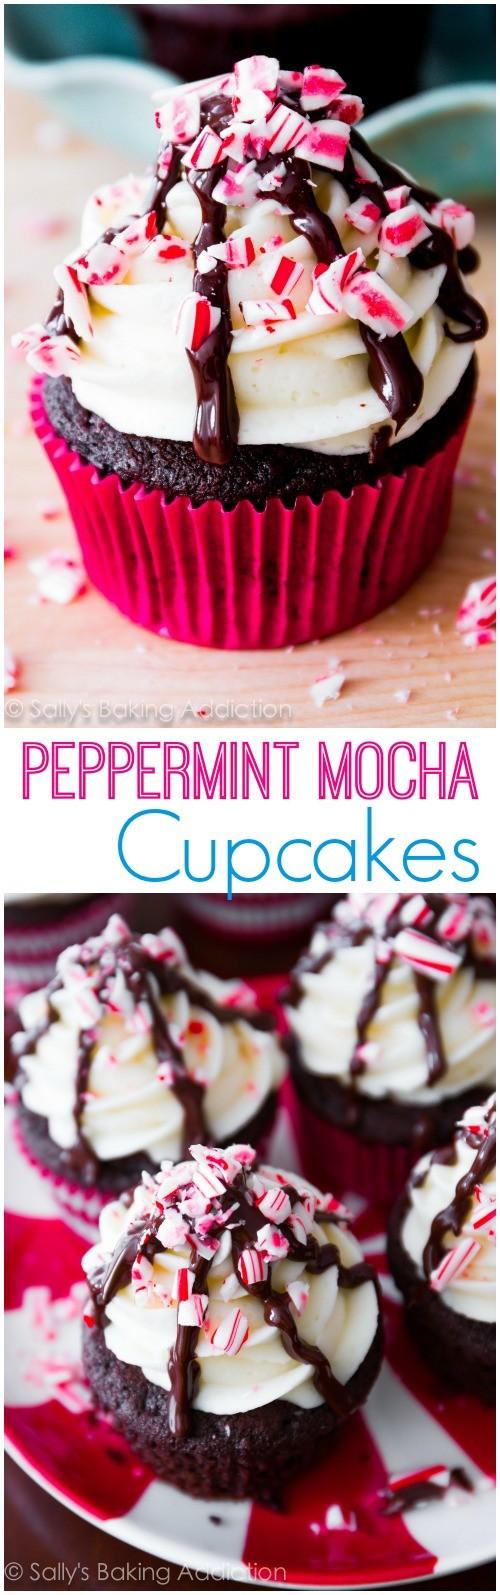 Peppermint-Mocha-Cupcakes-by-Sallys-Baking-Addiction